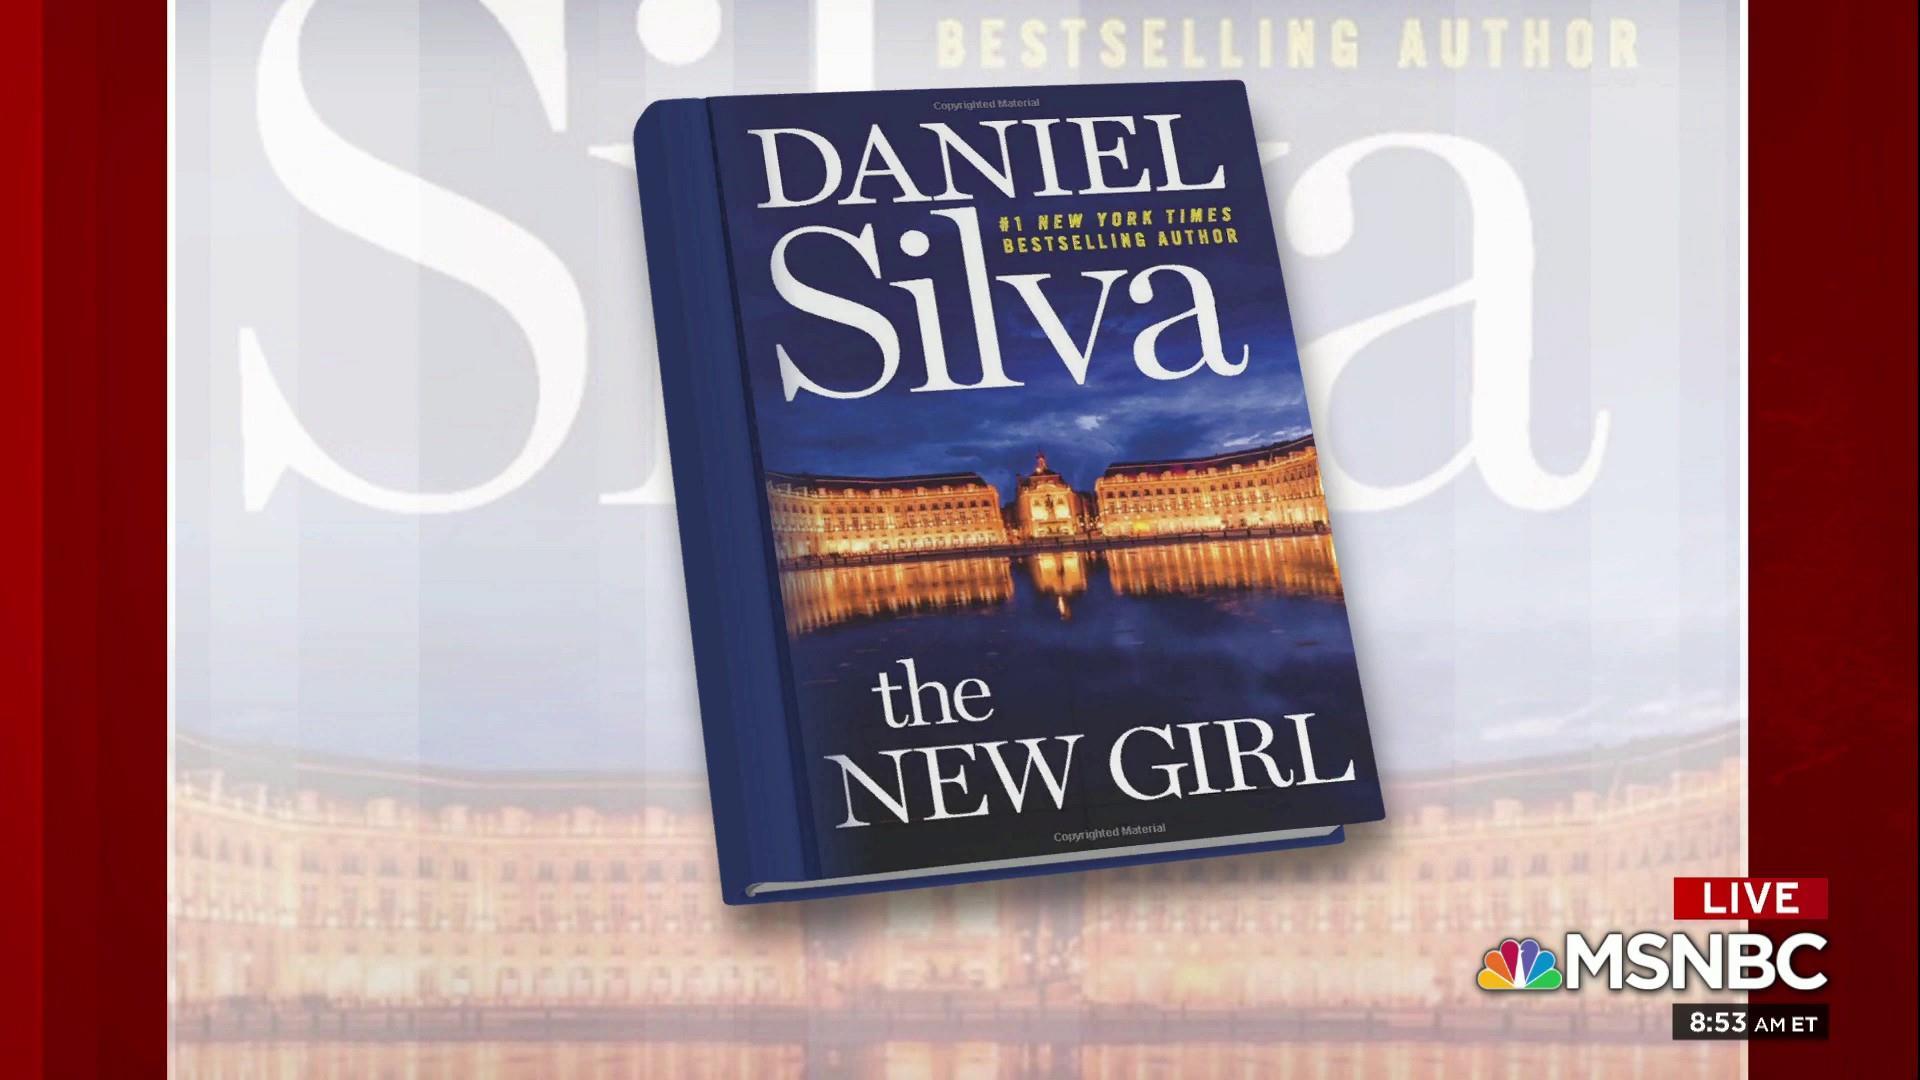 'New Girl' loosely based on Jamal Khashoggi murder